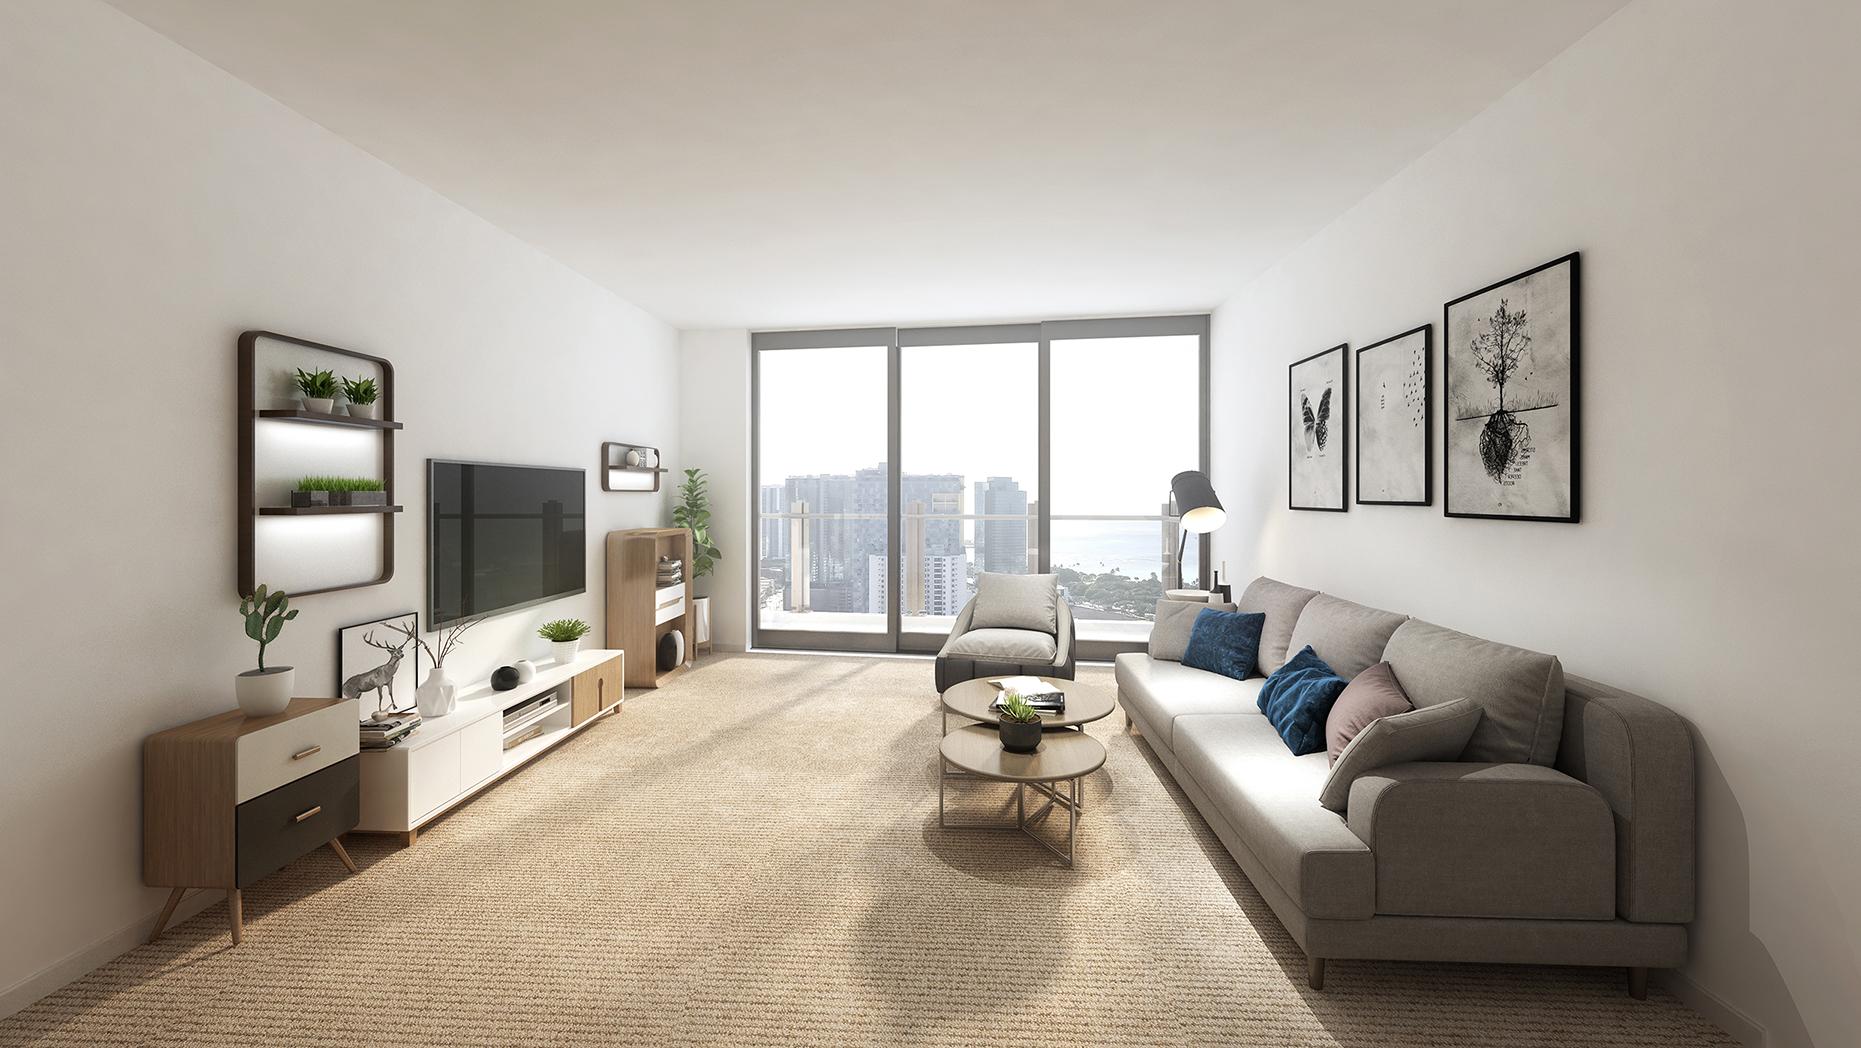 Ililani Living Room Rendering